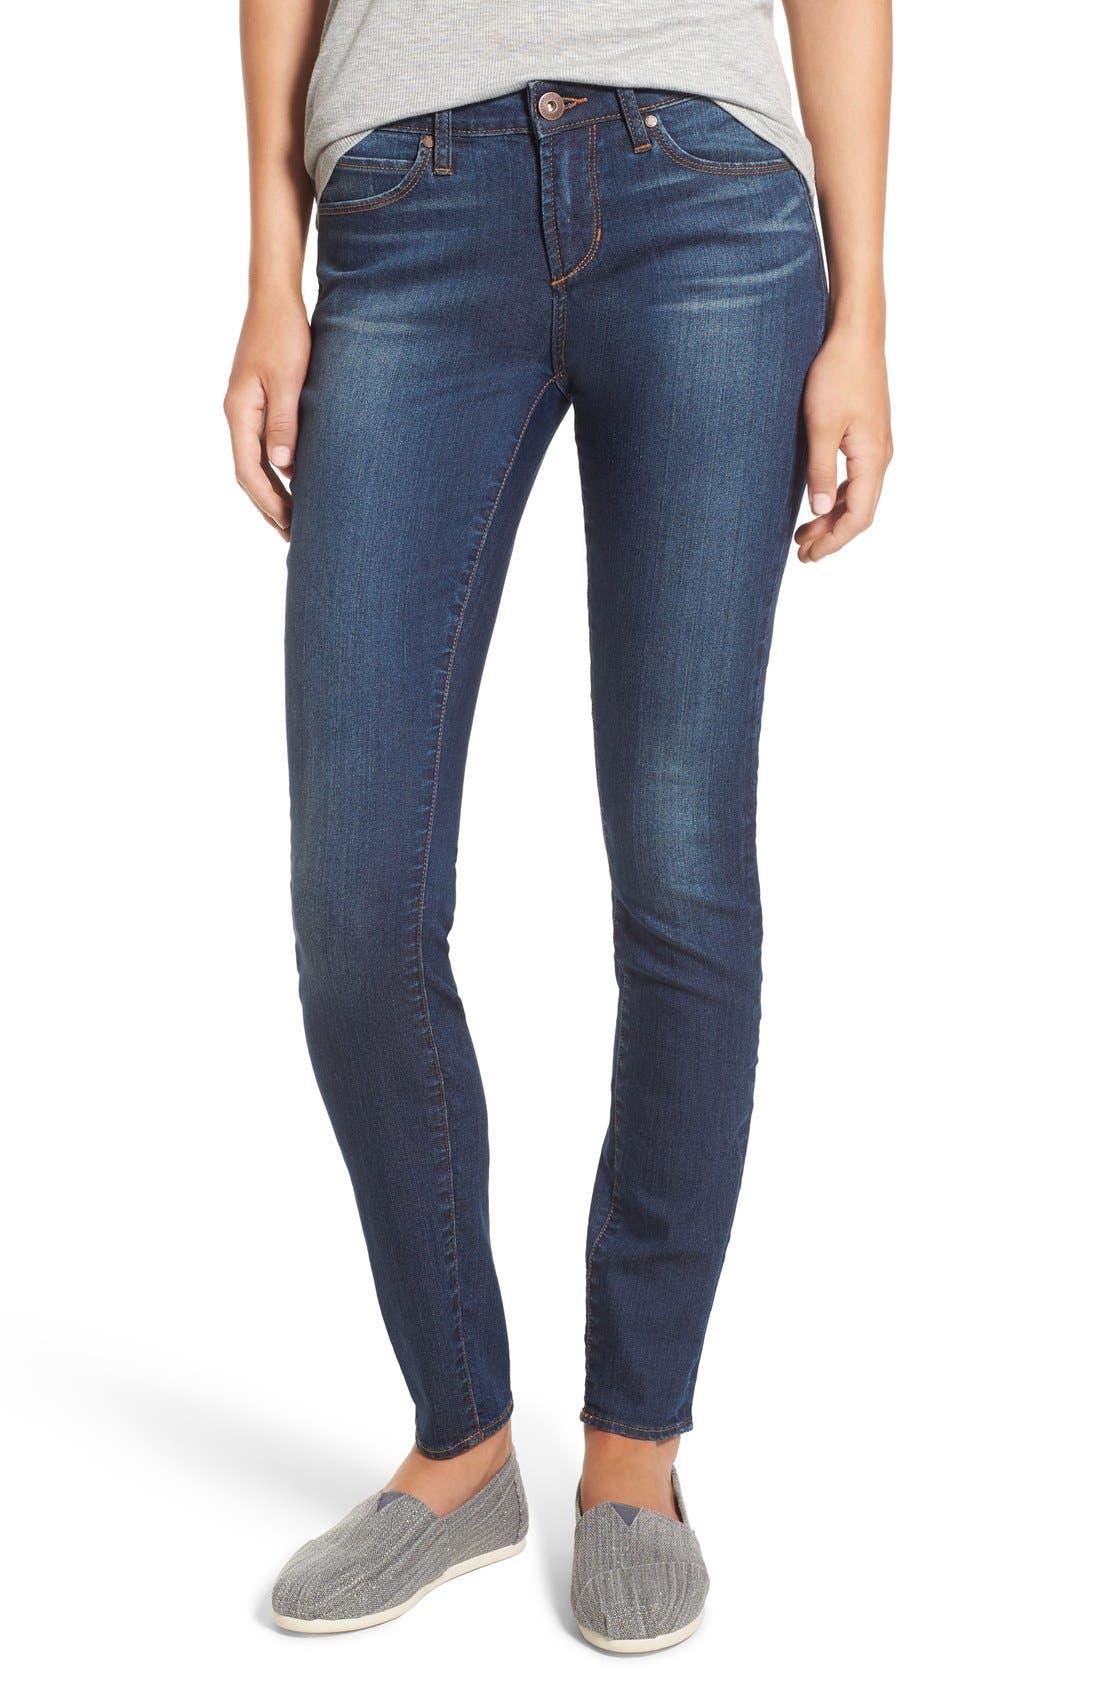 Alternate Image 1 Selected - Articles of Society 'Mya' Skinny Jeans (Americana)